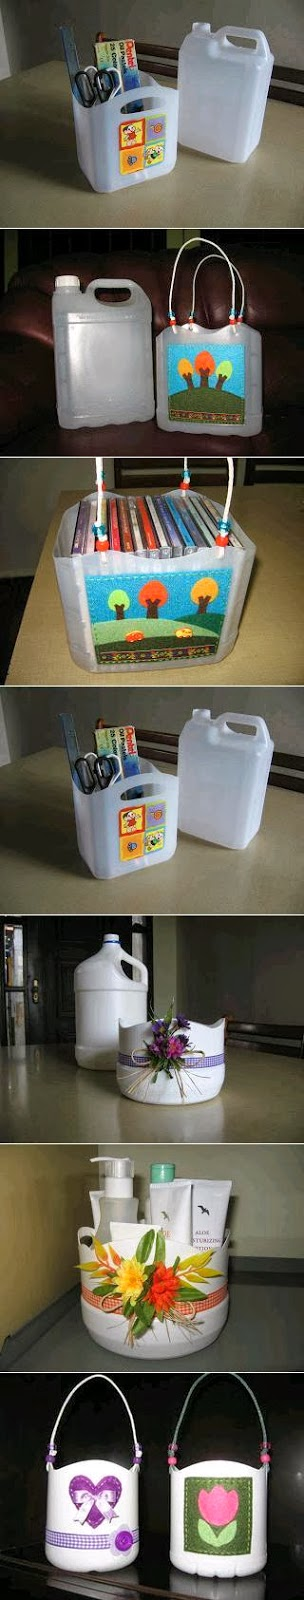 Hot diy ideas recycling plastic bottle baskets - Plastic bottles recycling ideas boundless imagination ...